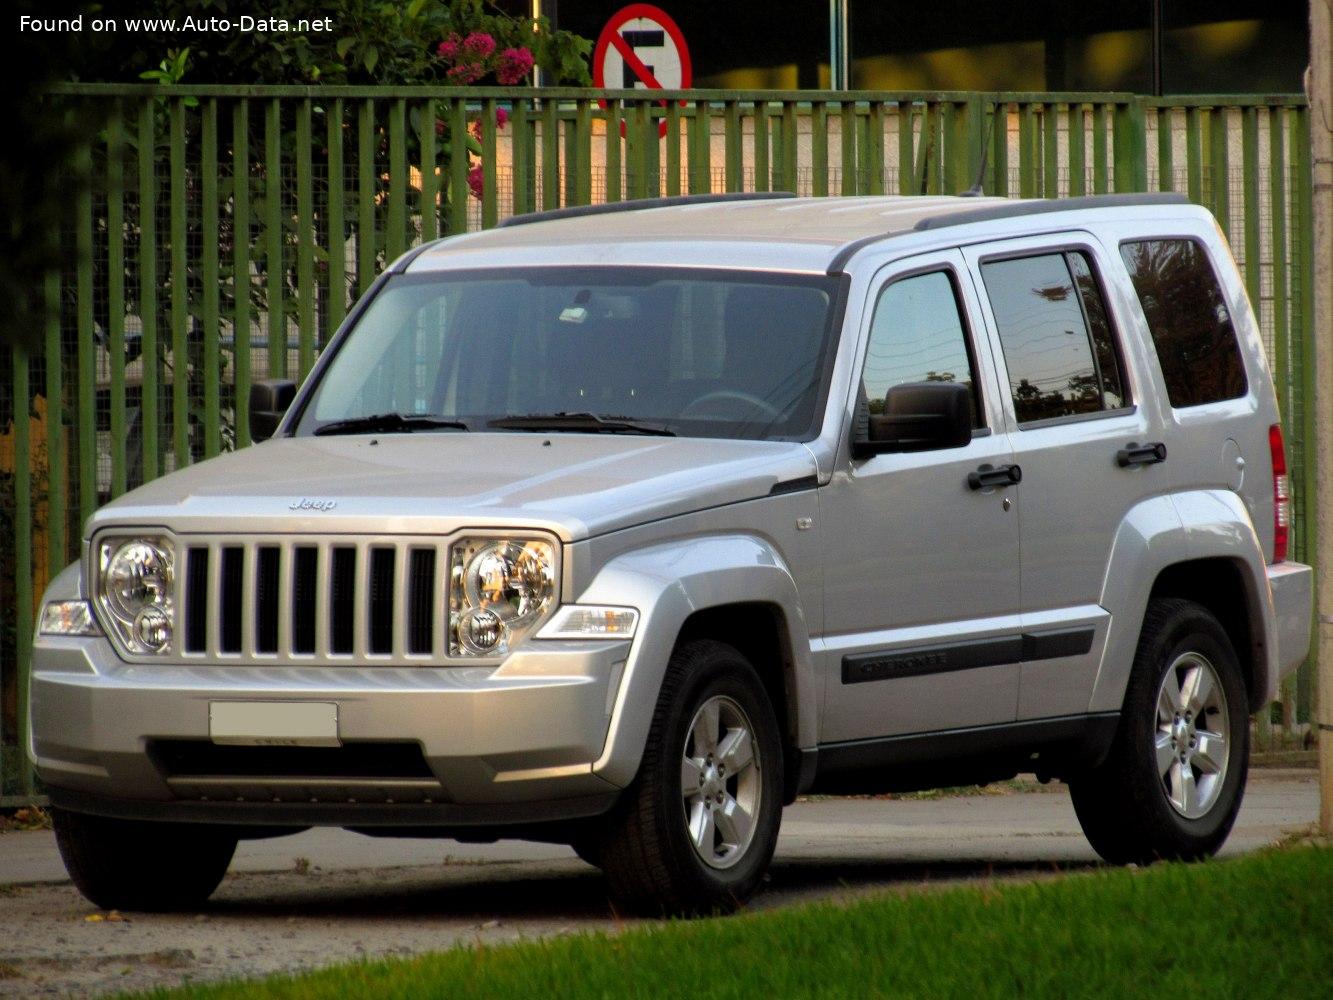 Jeep Cherokee (Photo Credit: auto-data.net)